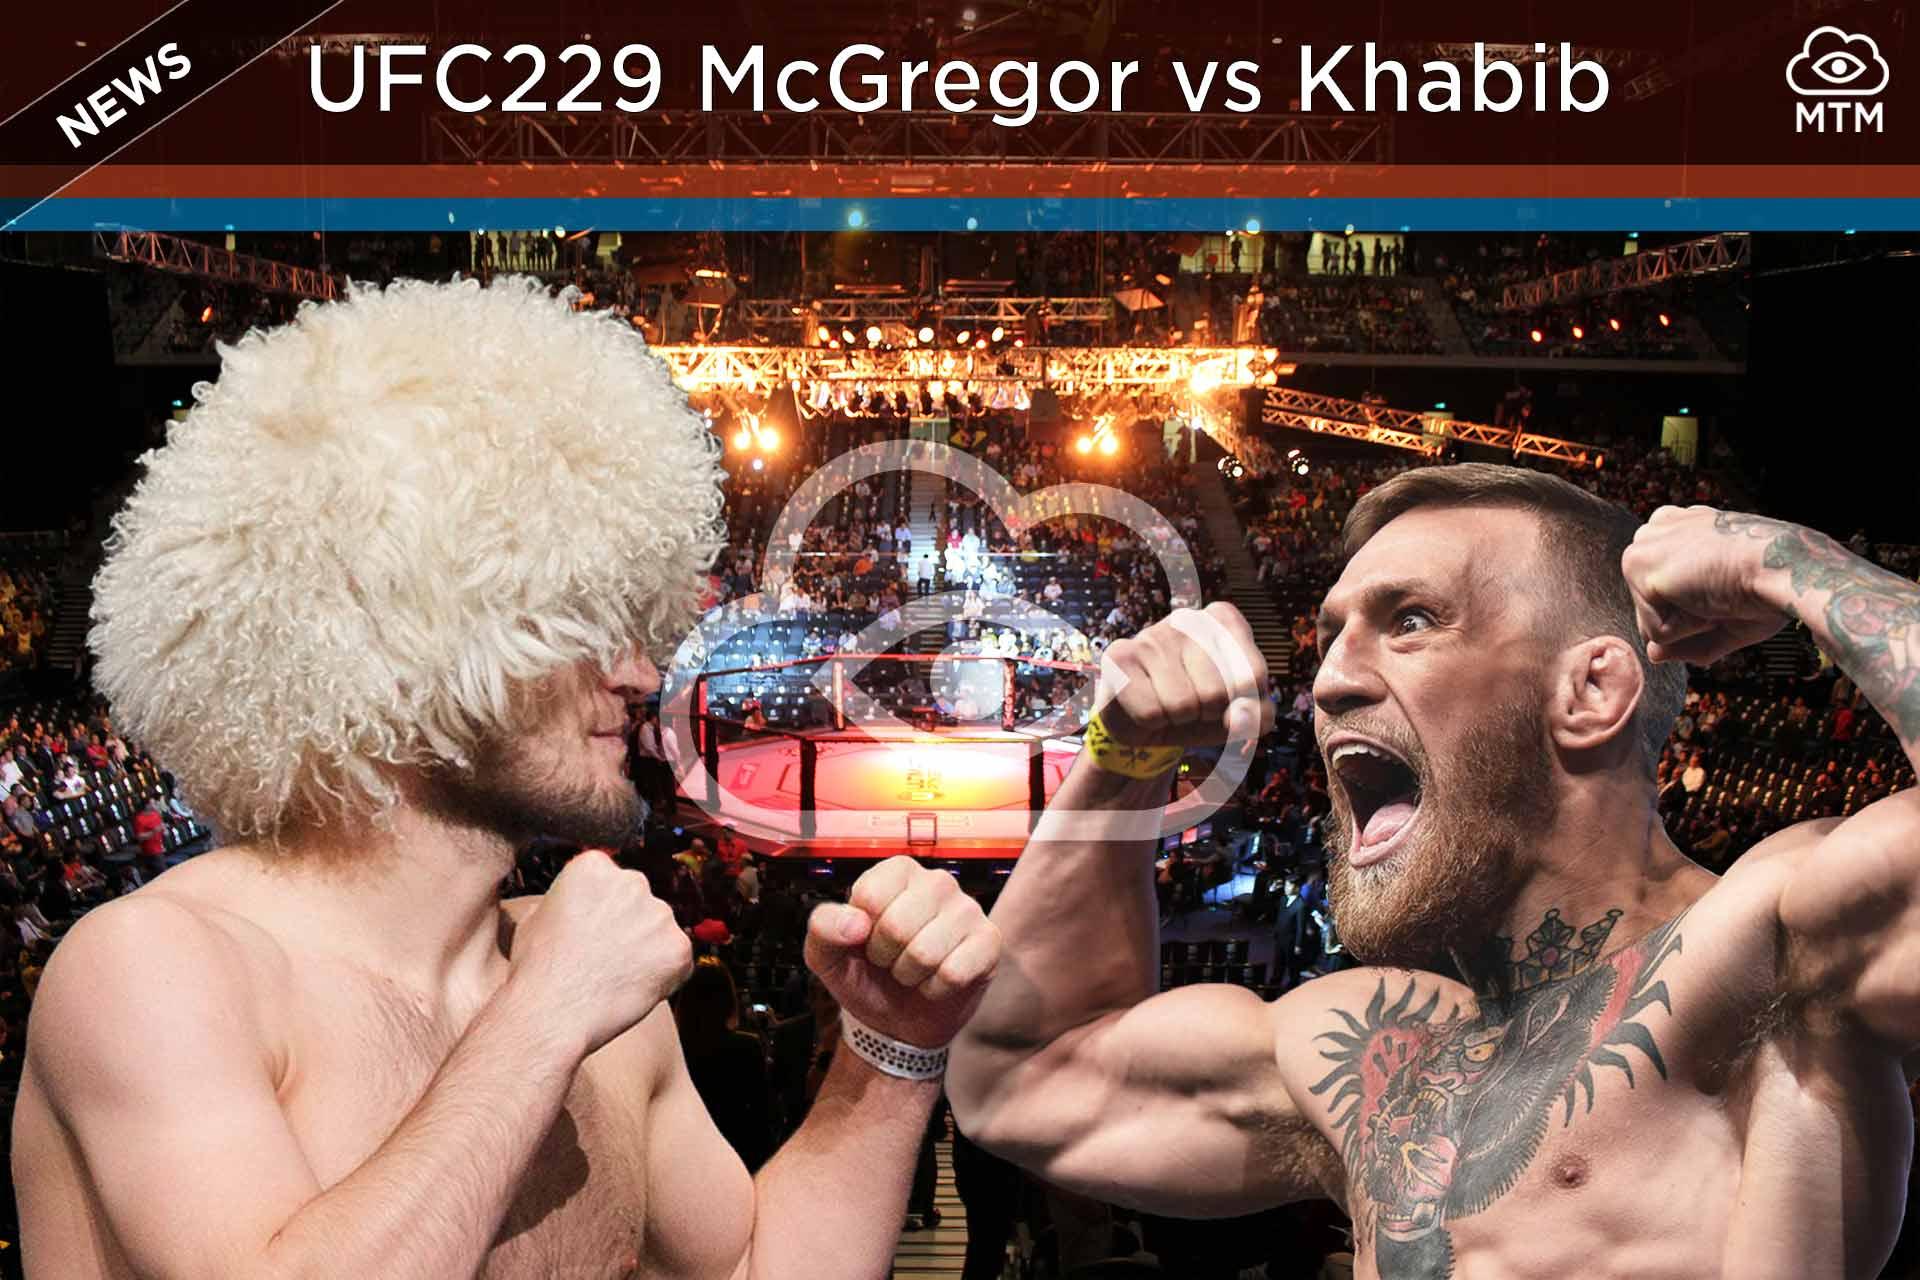 Nola ikusi UFC 229 McGregor vs Khabib Fight Live Streaming Online